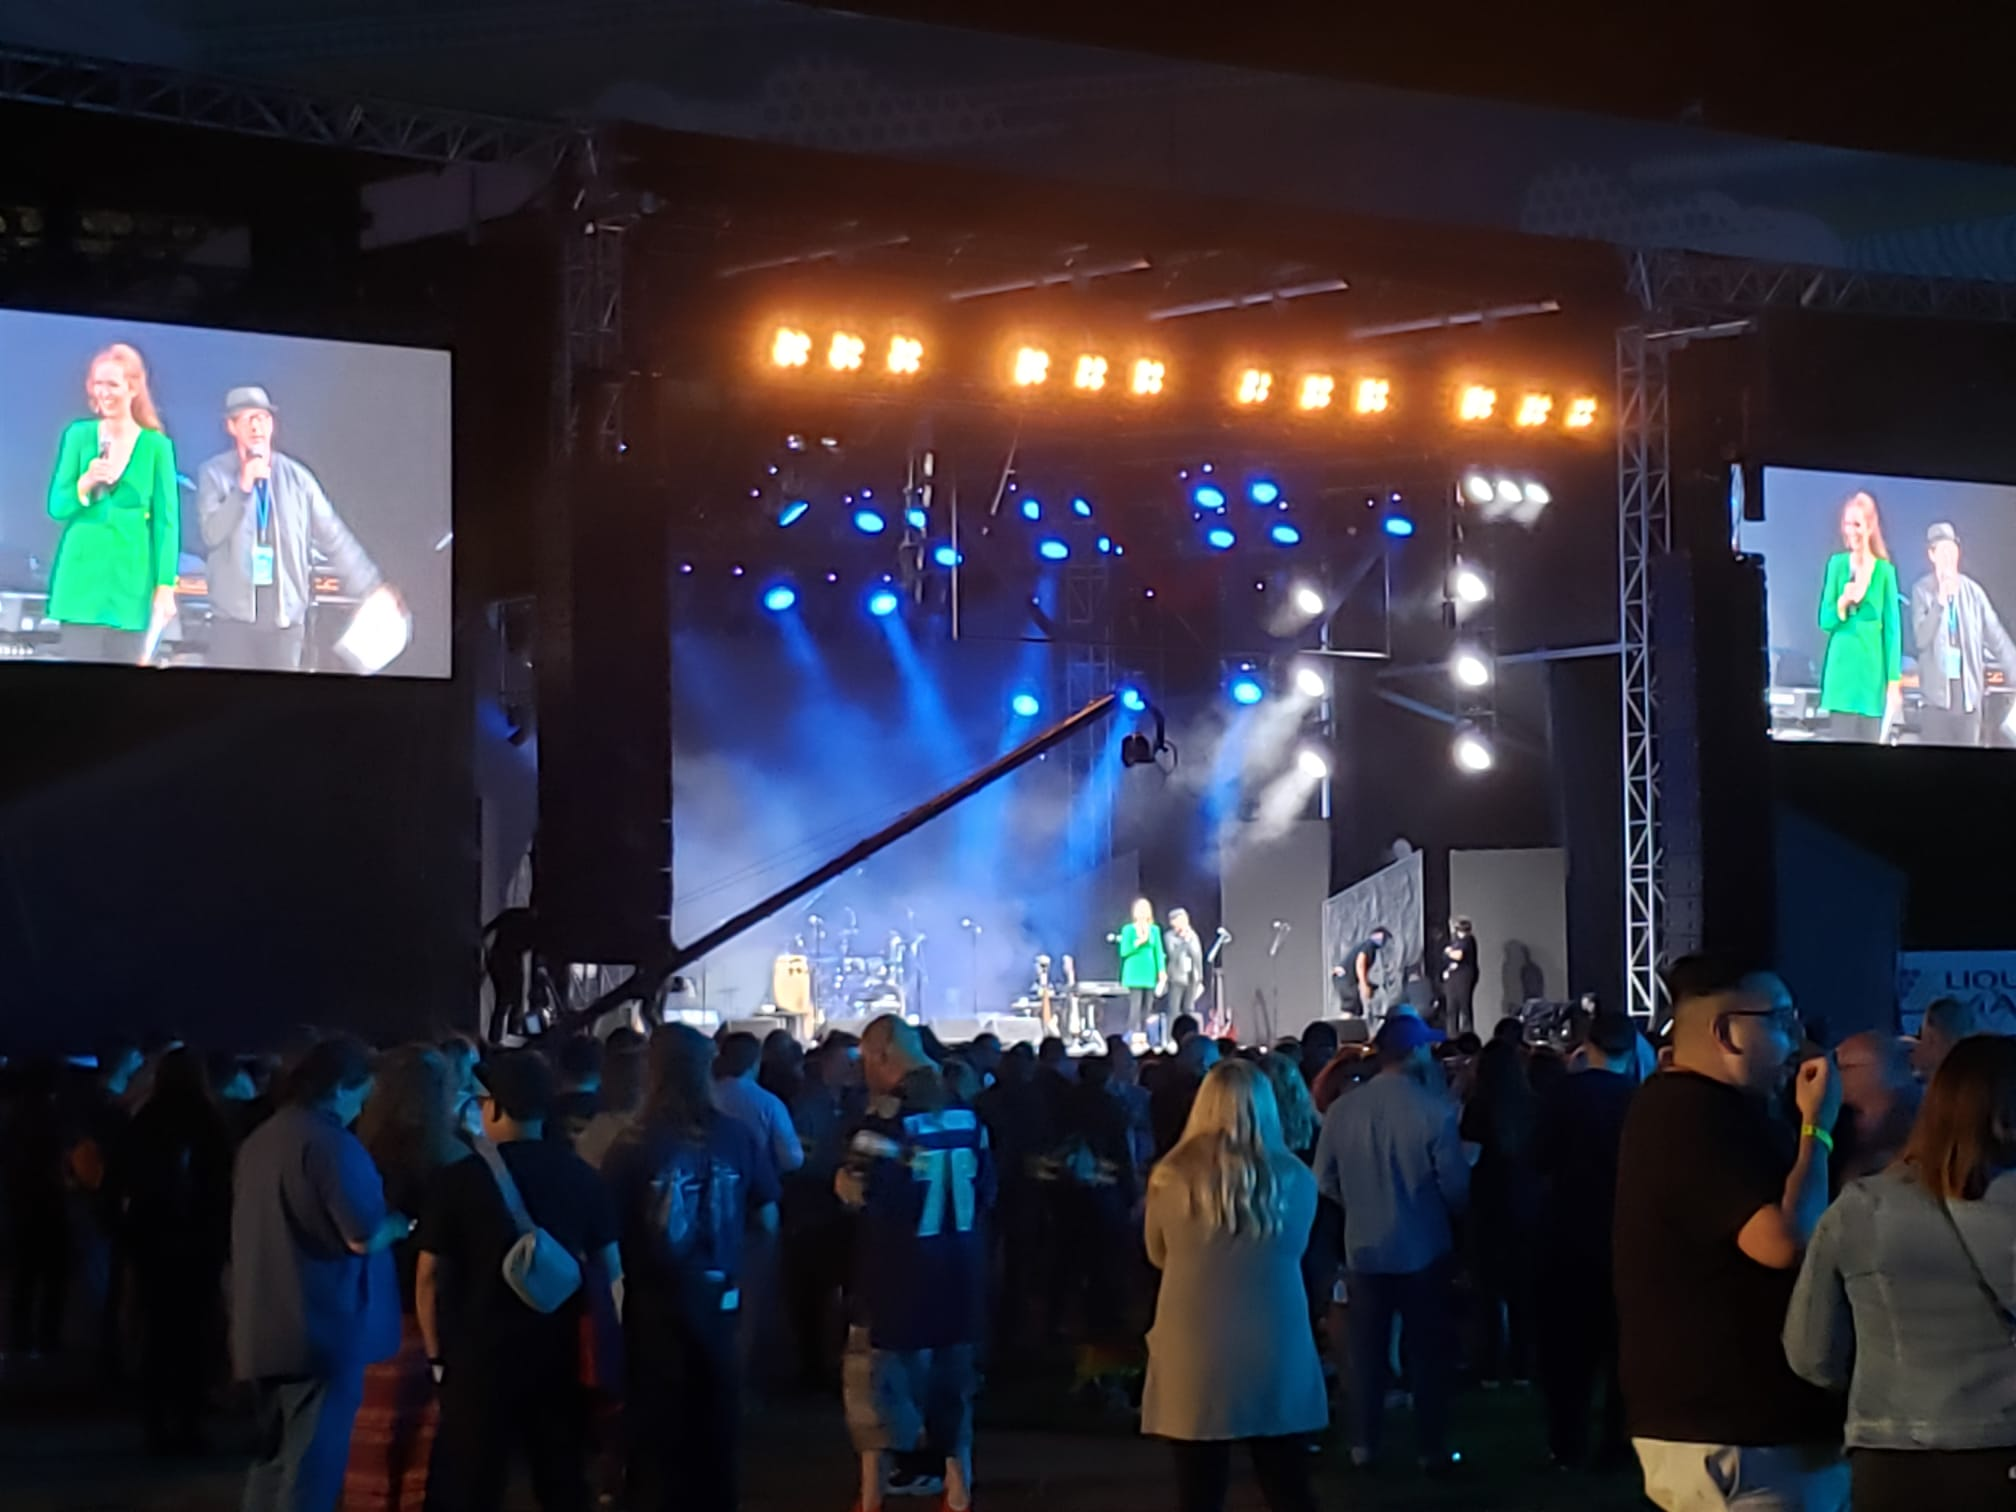 Unite 150 Concert / Concert Unissons 150, 2021